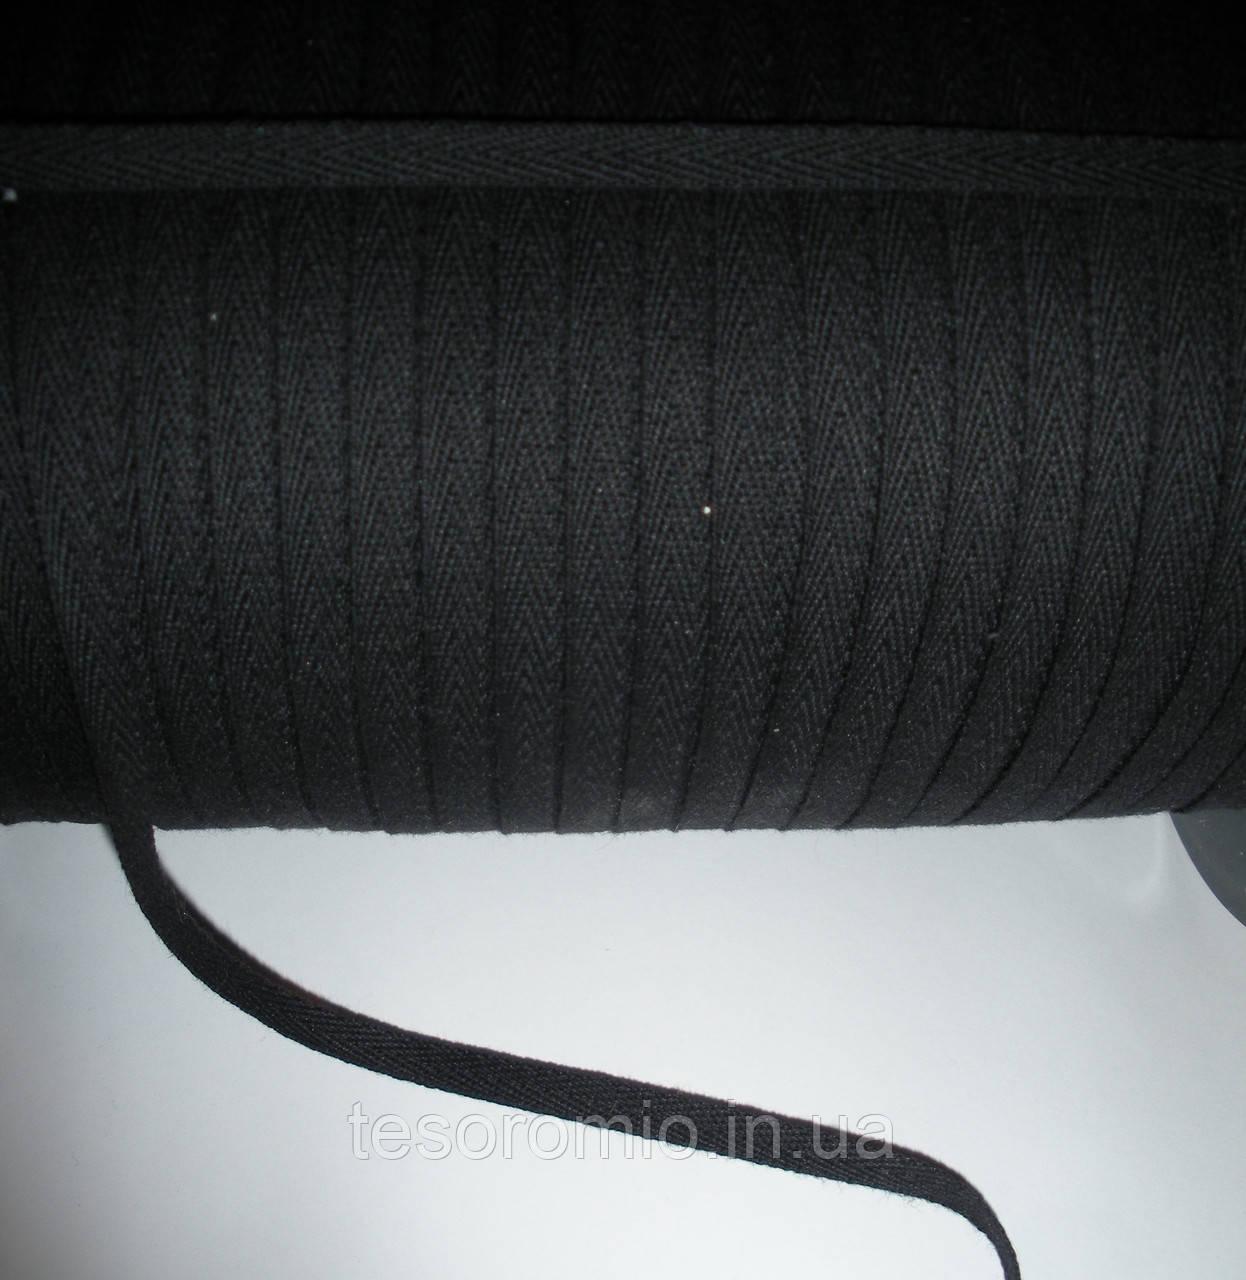 Киперная лента черная 6мм